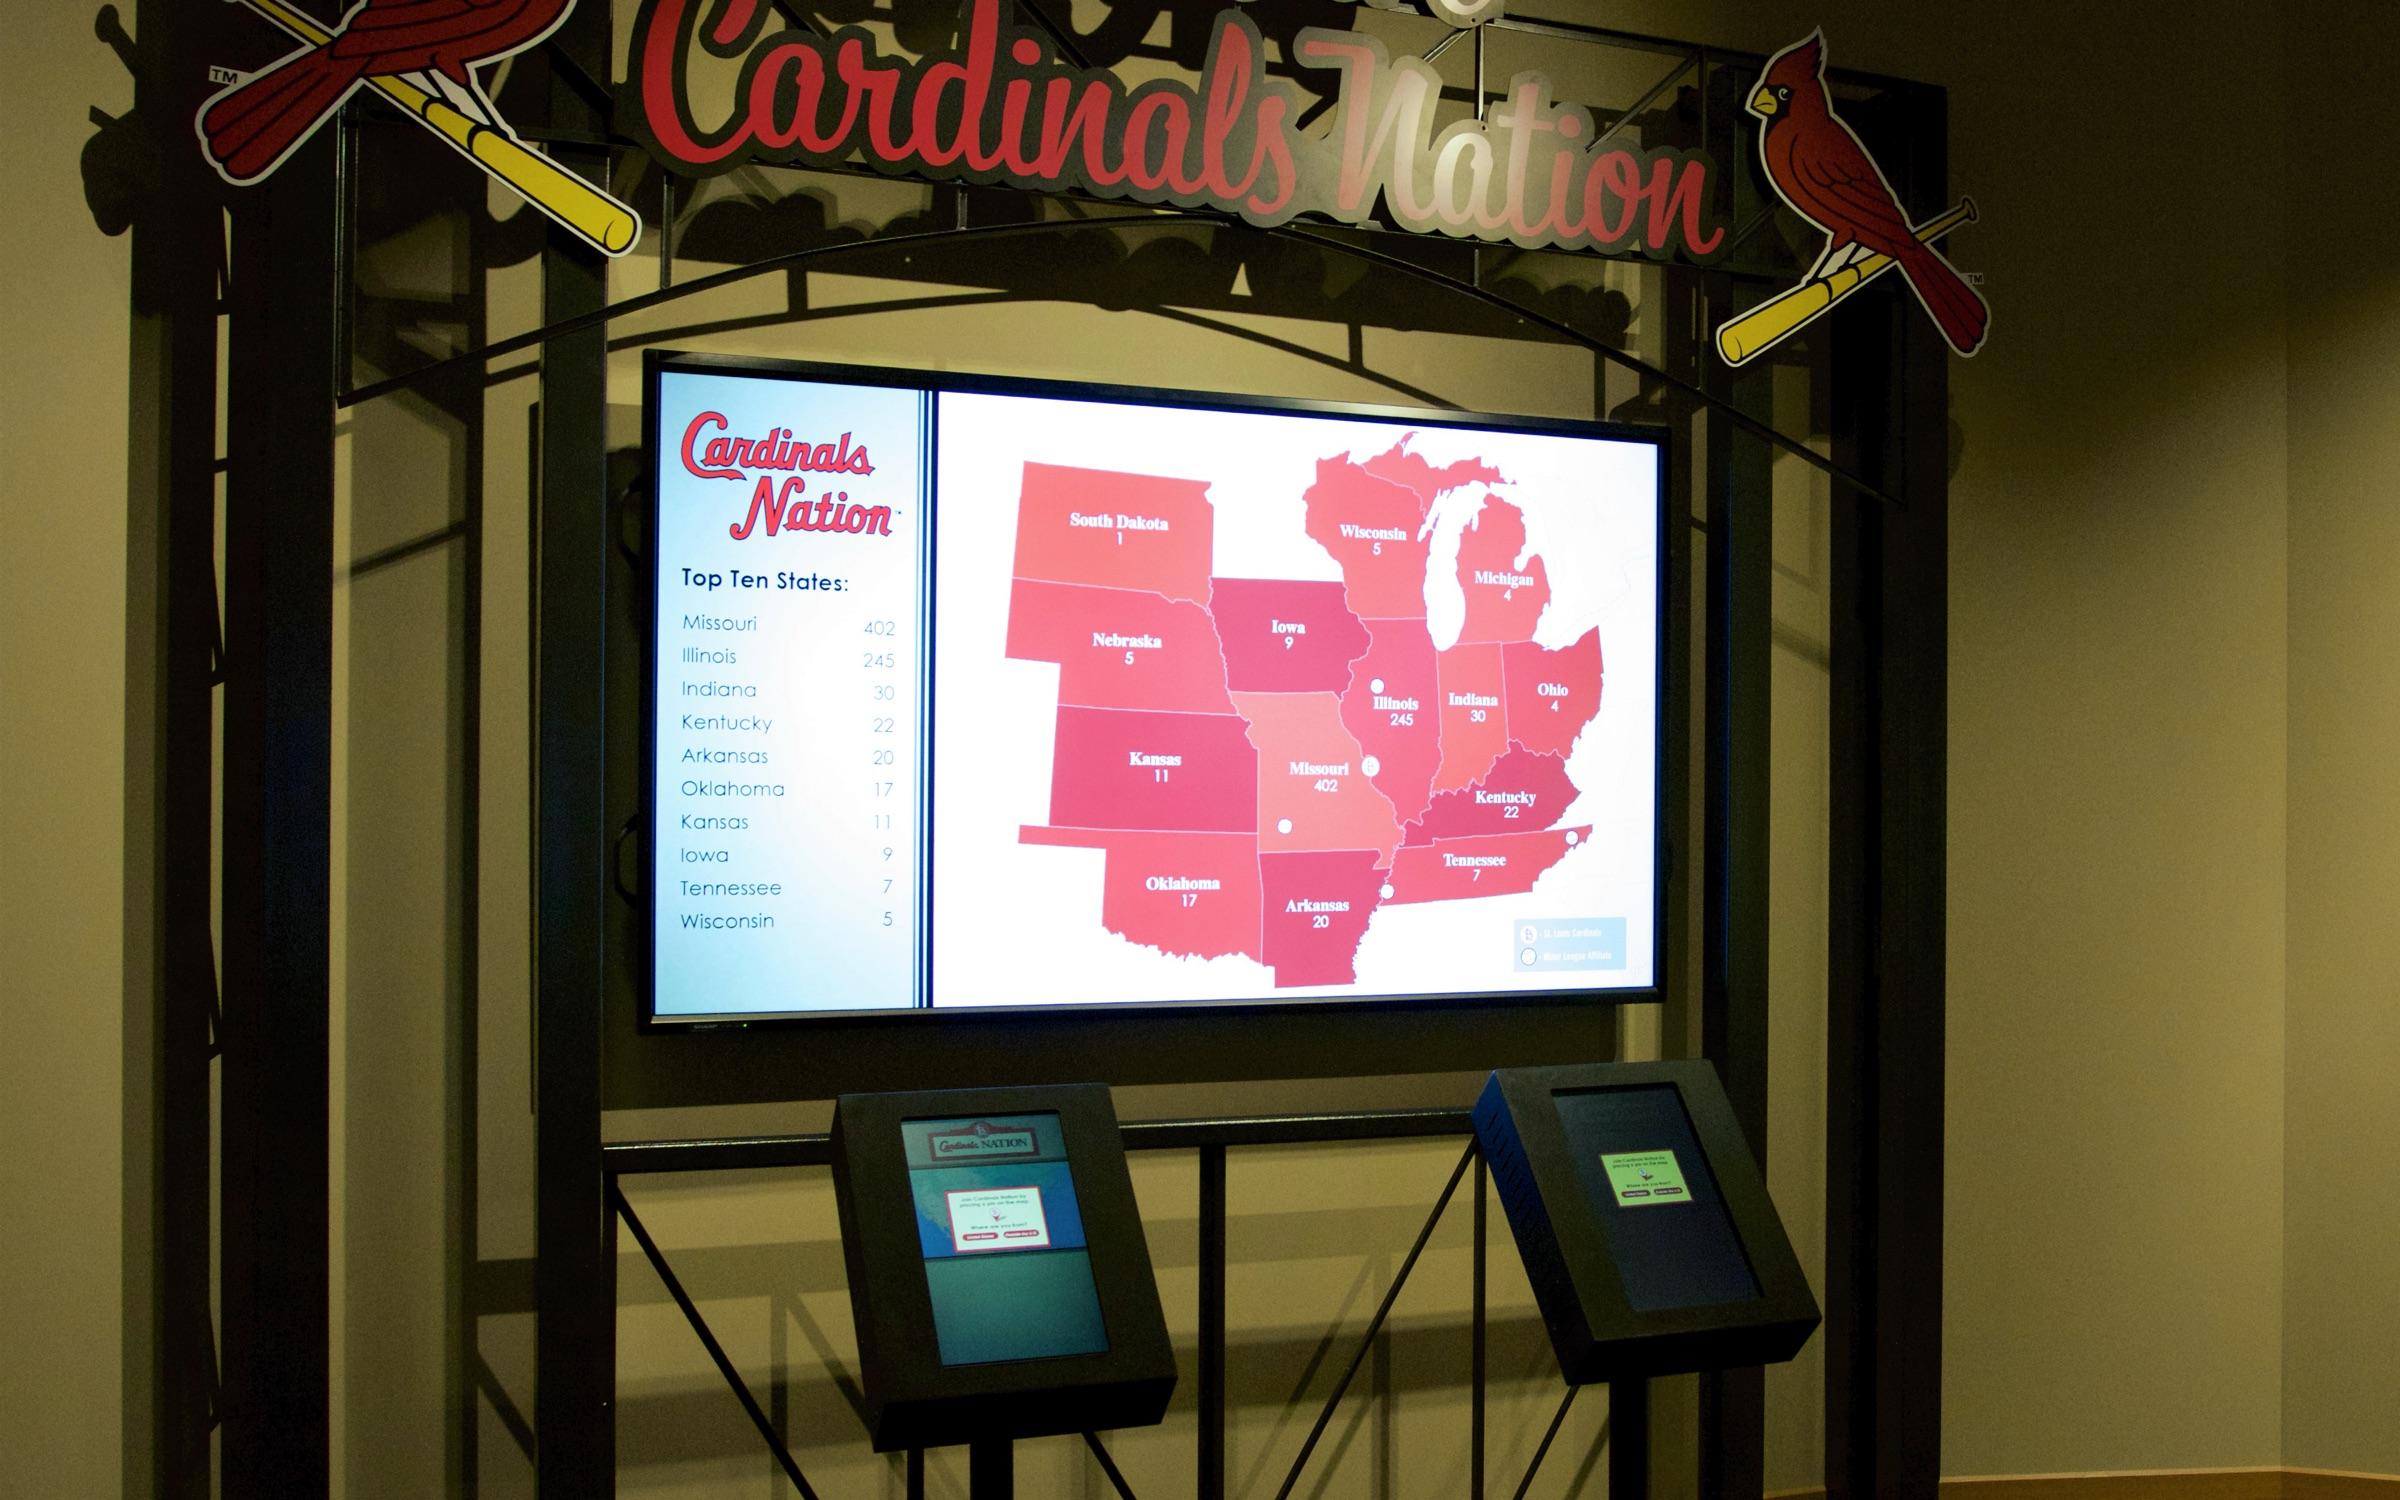 St. Louis Cardinals Hall of Fame Cardnials Nationa exhibit